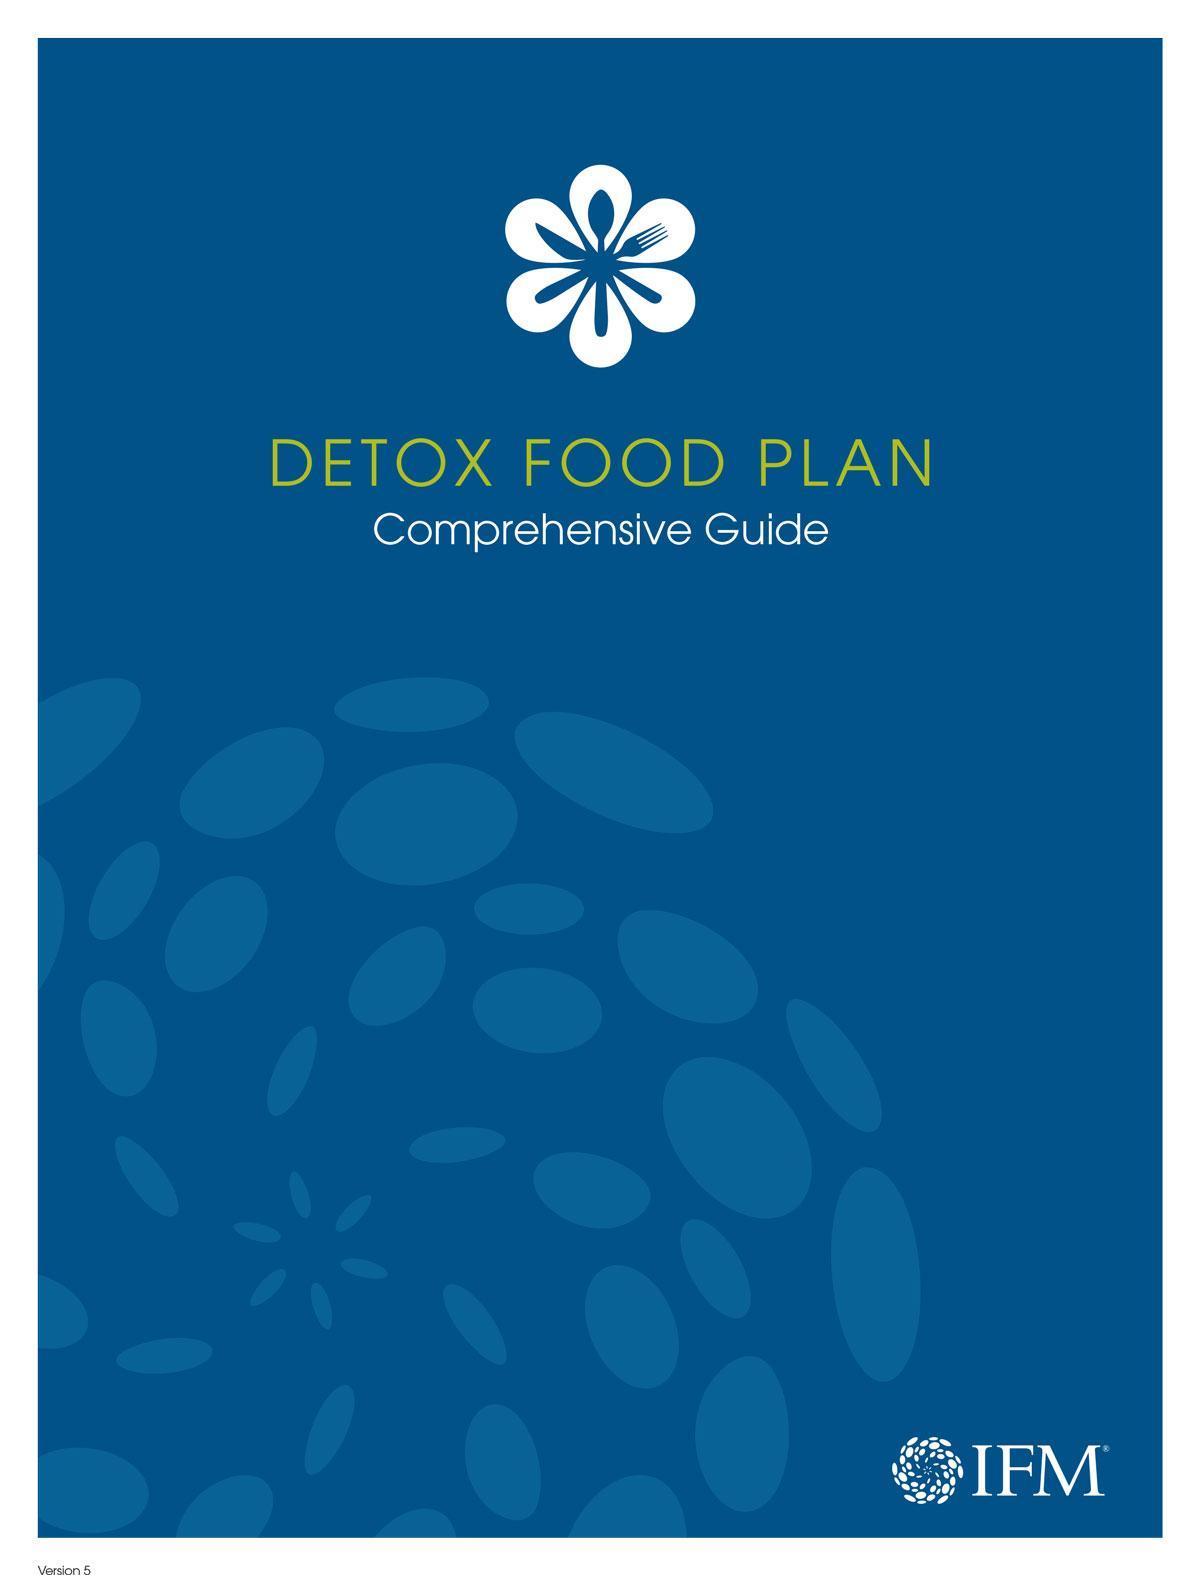 Detox Food Plan Comprehensive Guide